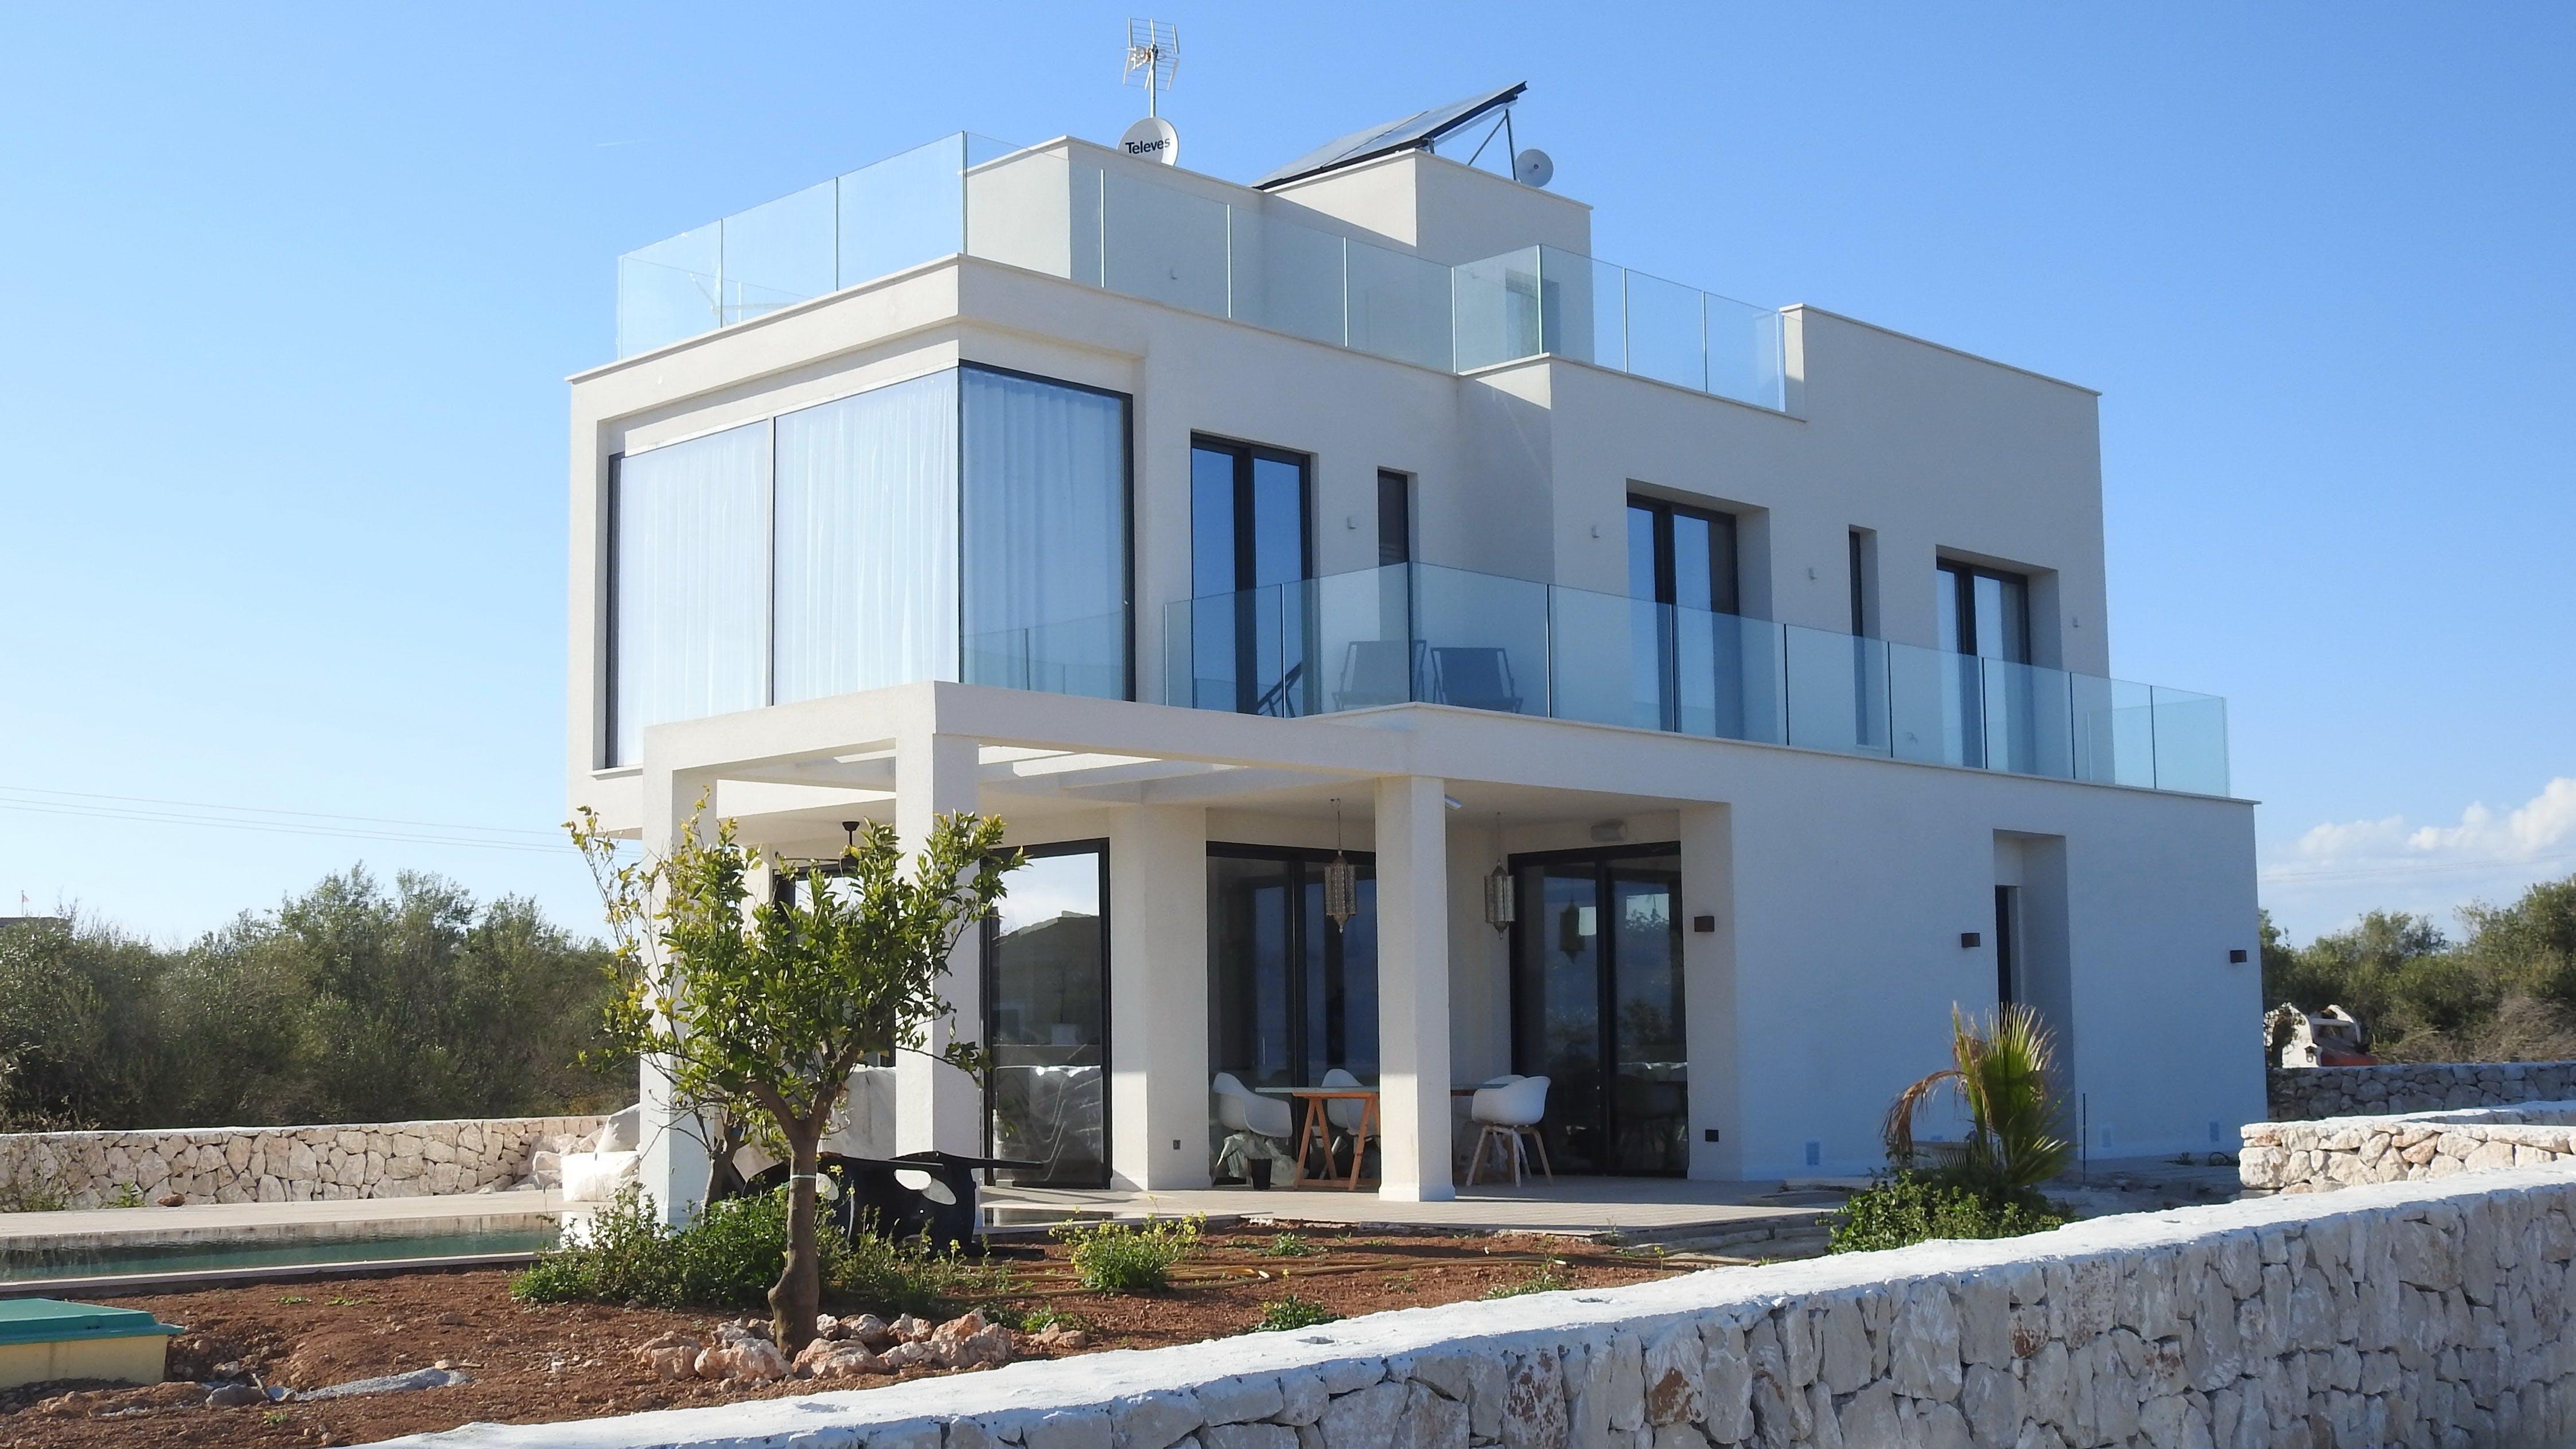 Kostnadsfri bild av arkitektur, balkong, byggnad, dagsljus